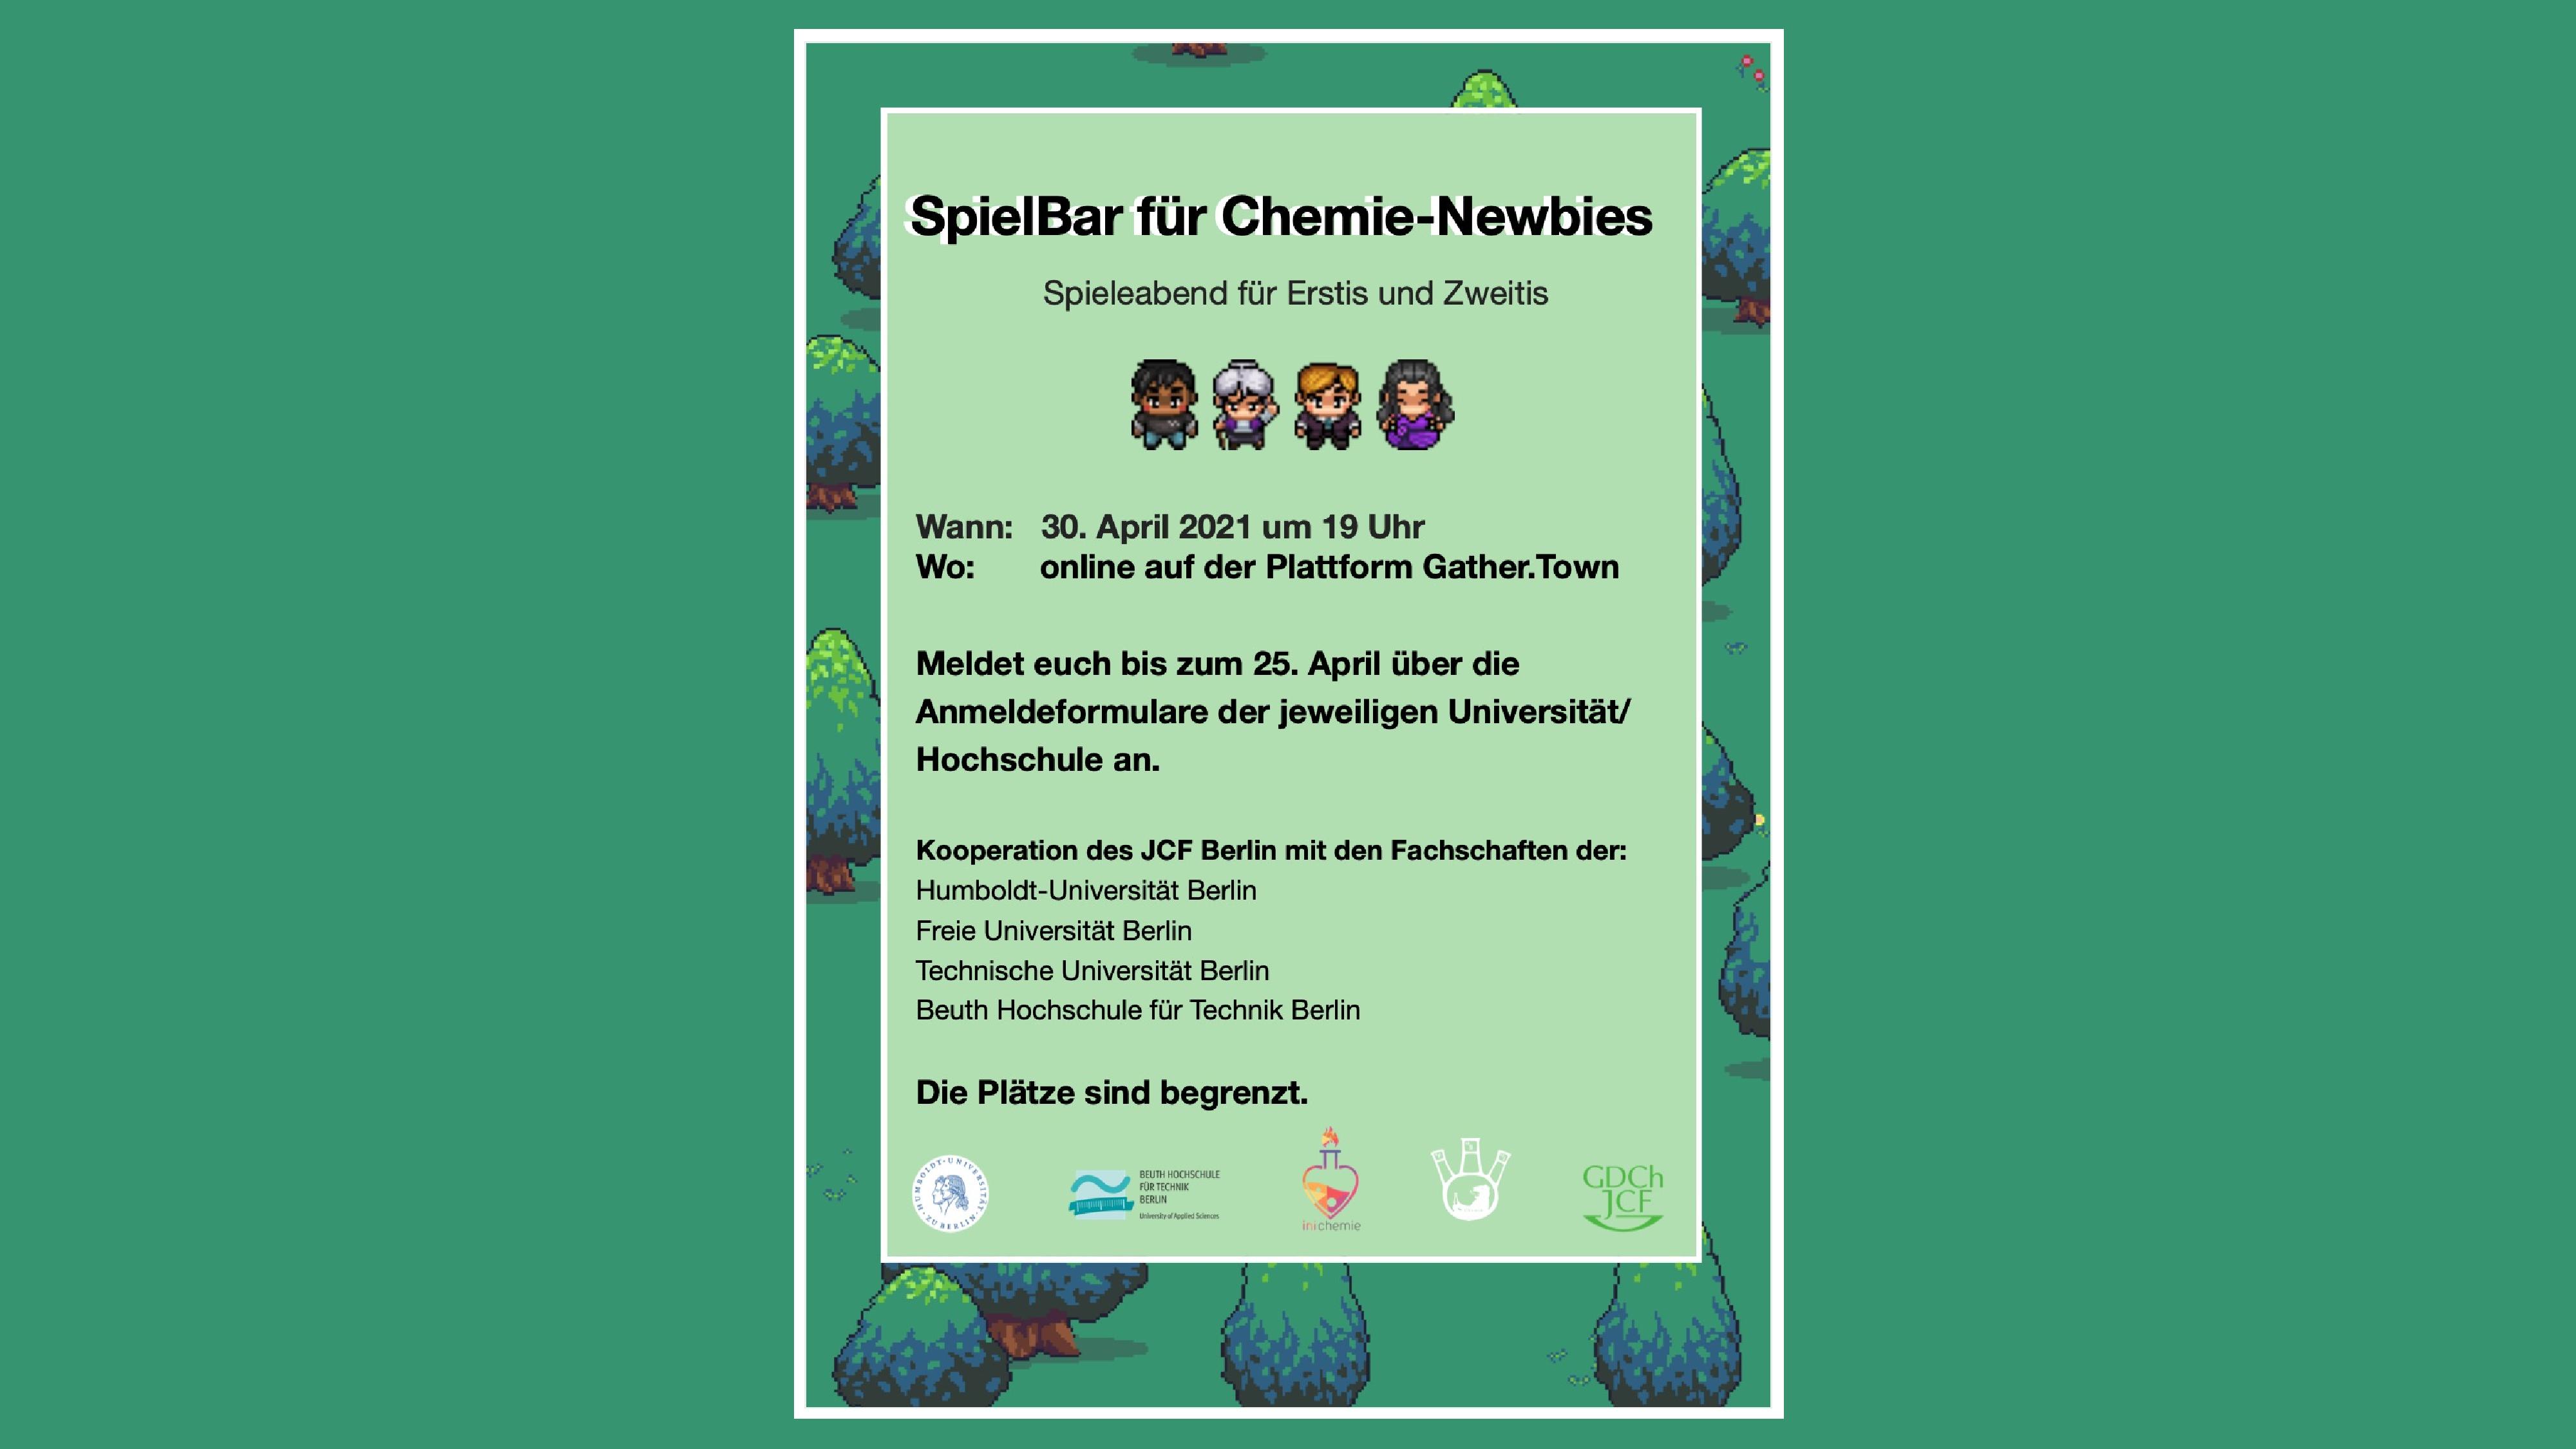 SpielBar_Chem_Newbies